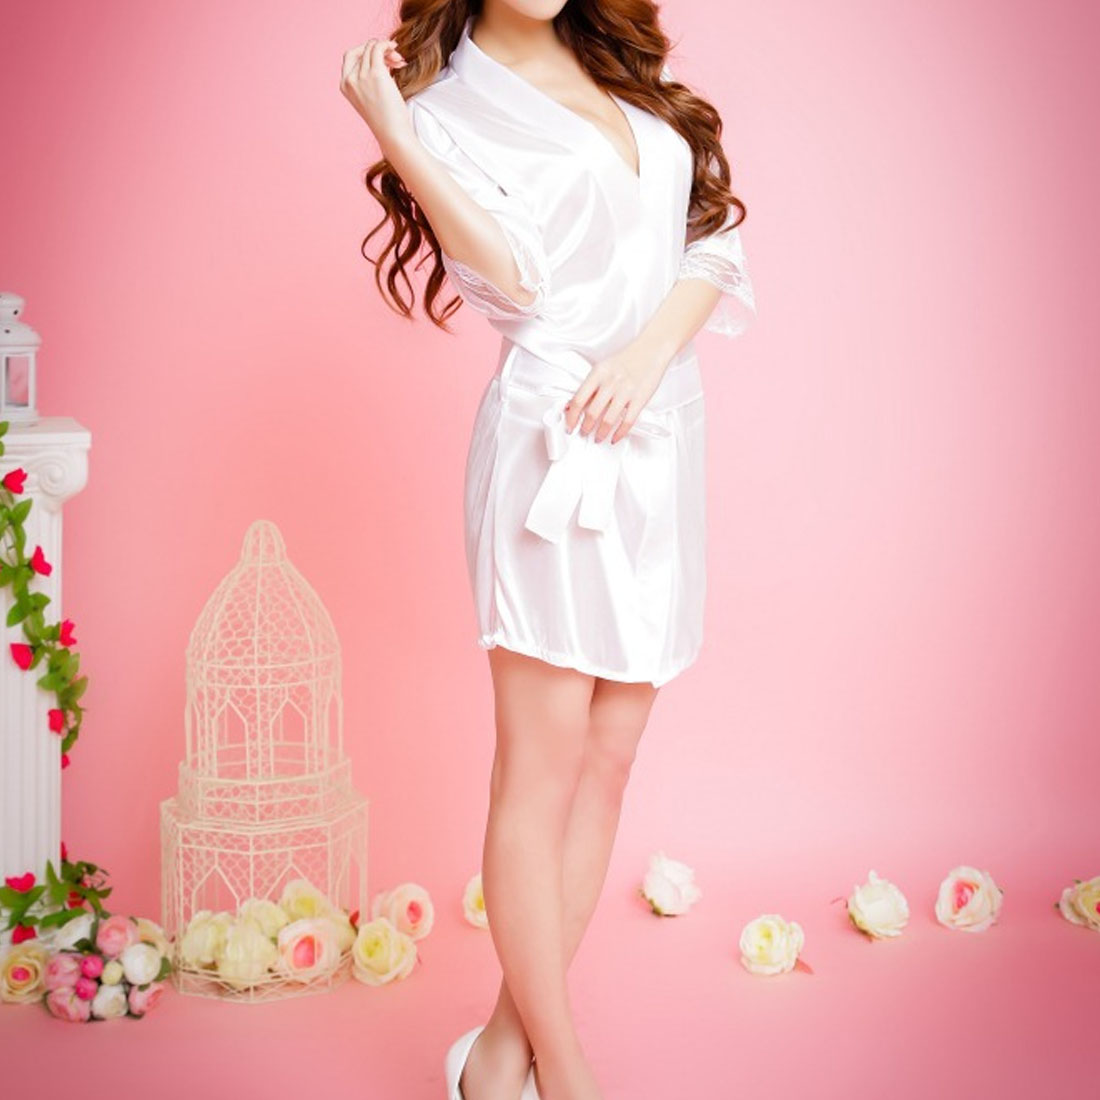 TOP Summer Spring Women Bathrobe Sexy Lingerie Sleepwear Nightgown Bath Robes Black Purple Pink White